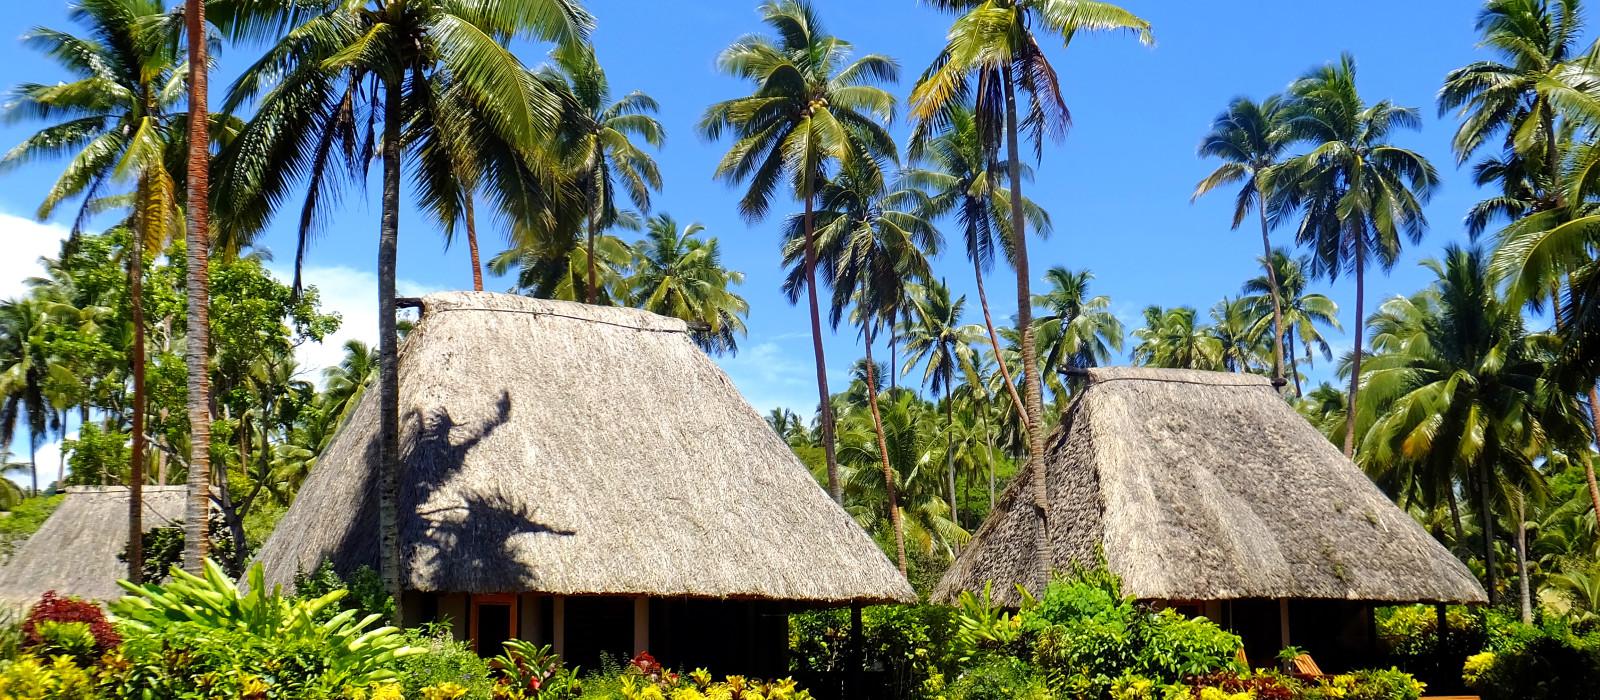 Destination Vanua Levu Fiji